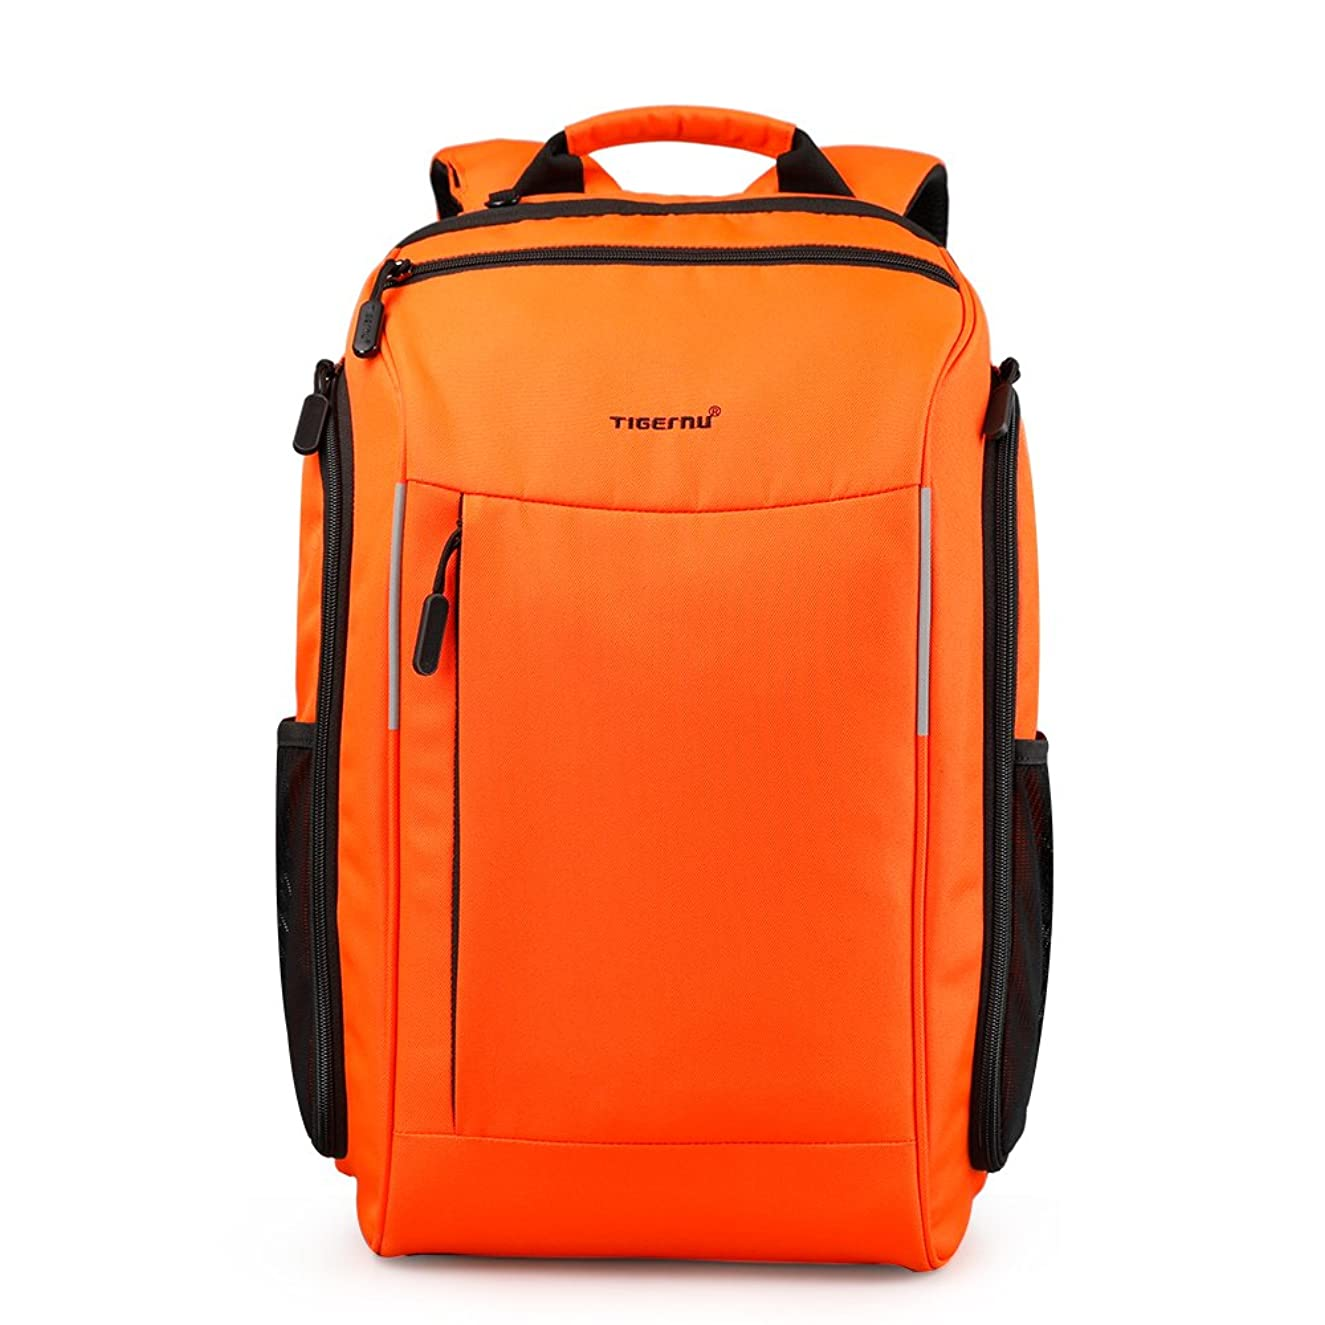 Tigernu Professional Laptop Backpack Computer Knapsack,Rucksack Hiking Bags Waterproof Outdoor Daypack Fits Up to 15.6 Inch Laptop(Orange)